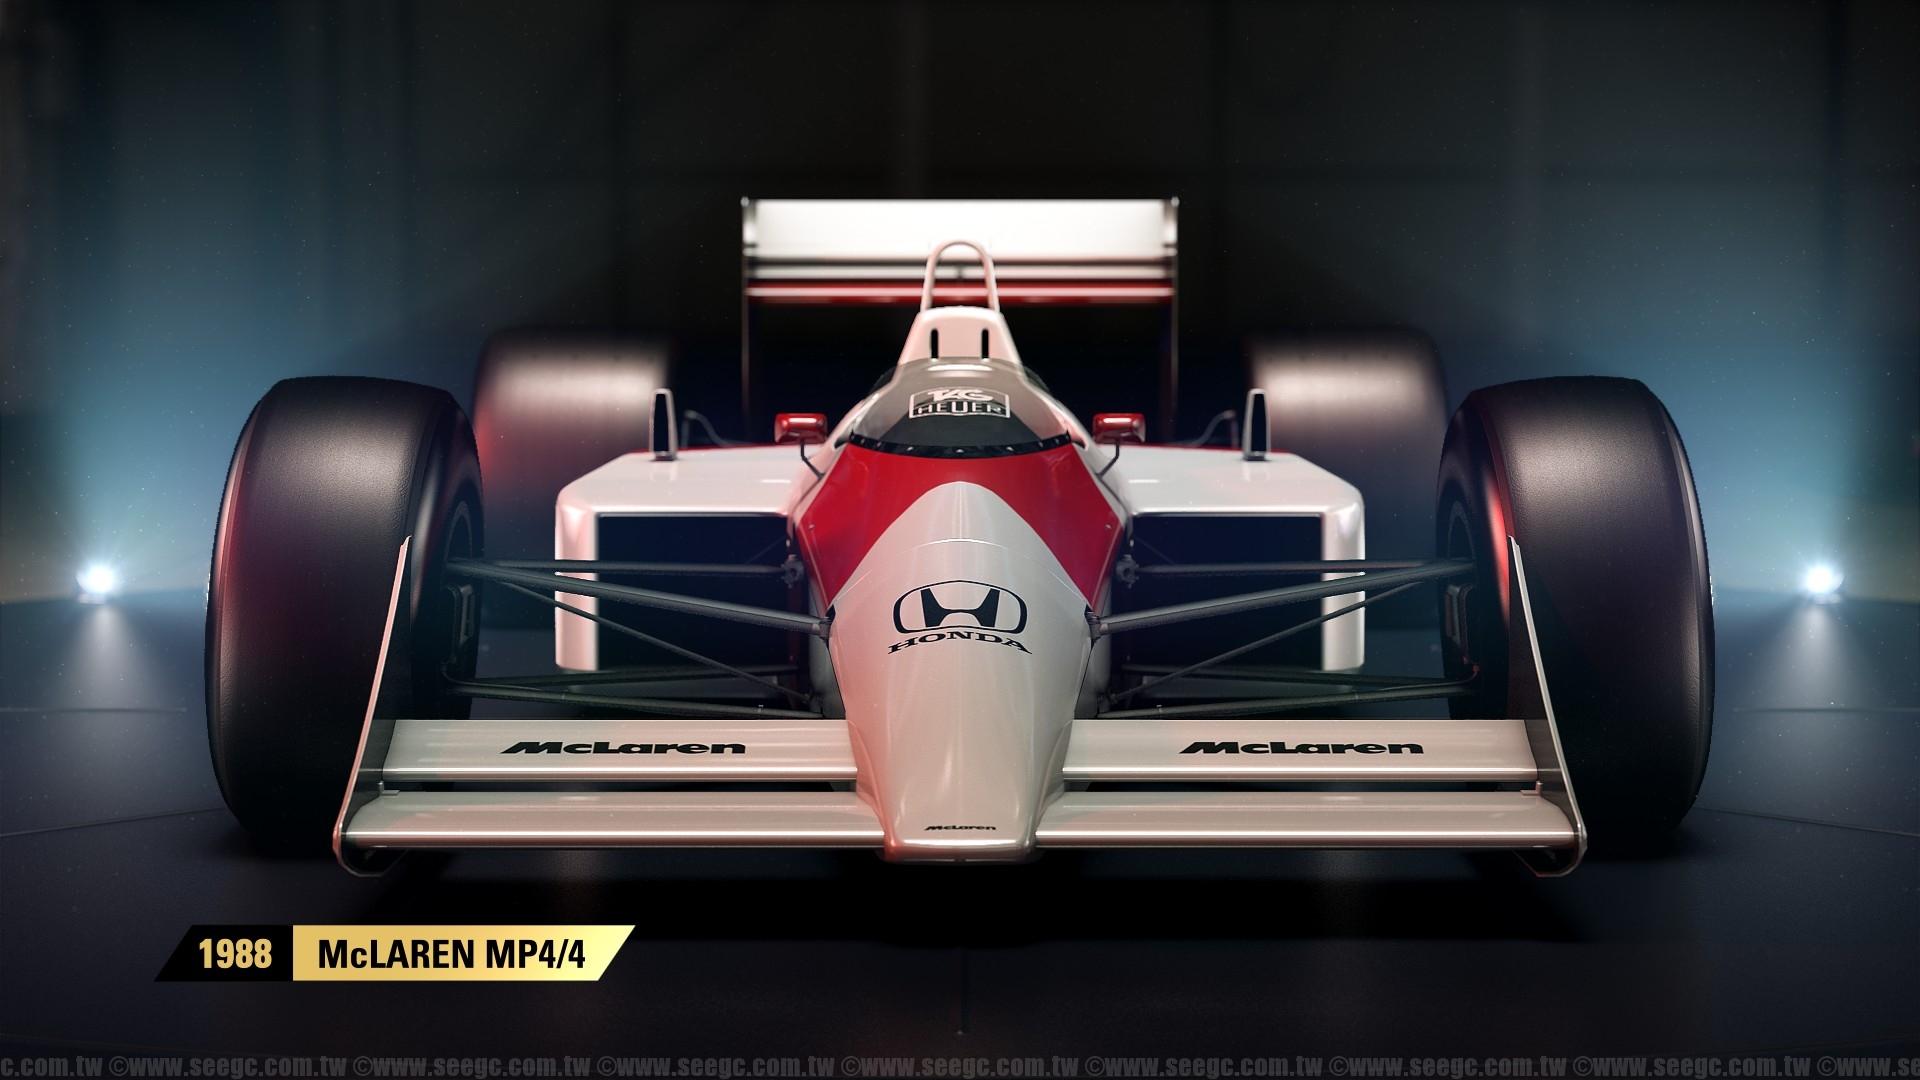 F1_2017_announce_image_1988_McLaren_MP4_4